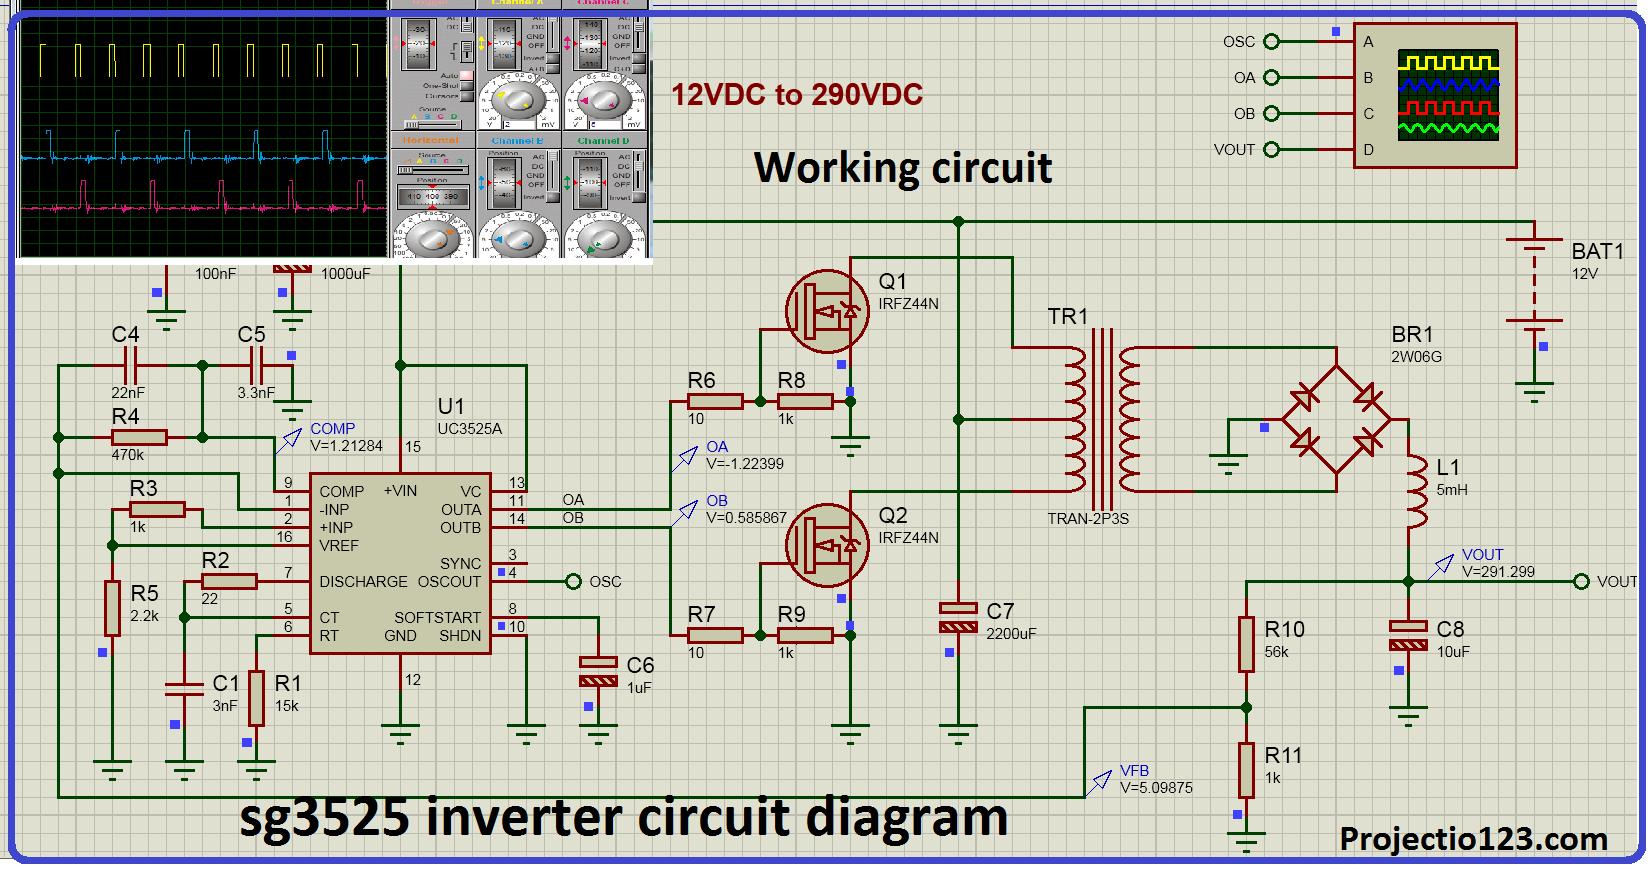 sg3525 inverter circuit diagram and sg3525 pinout